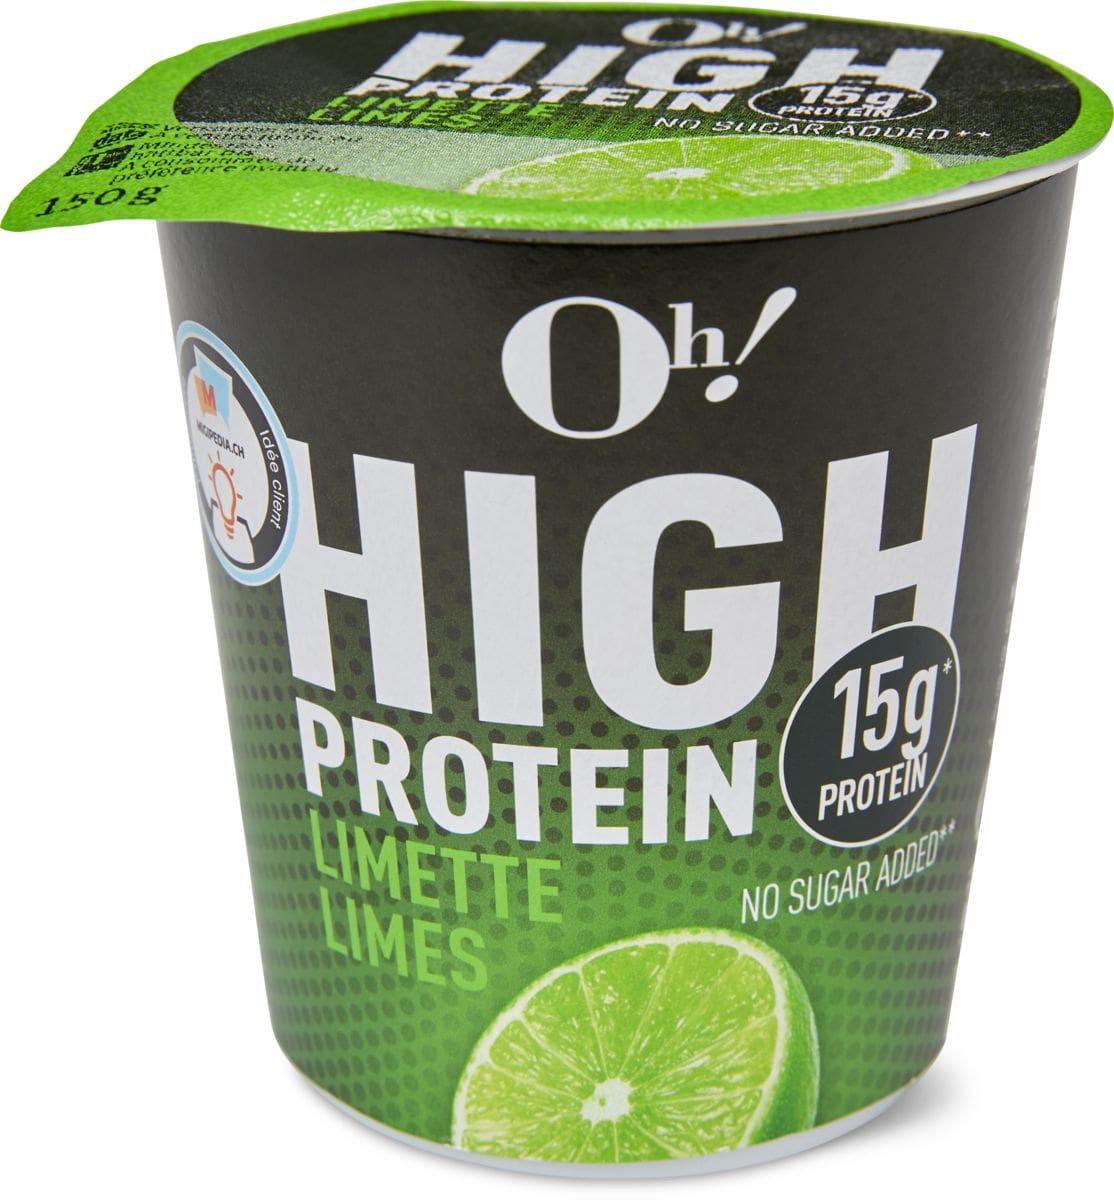 Oh! High Protein Limetten